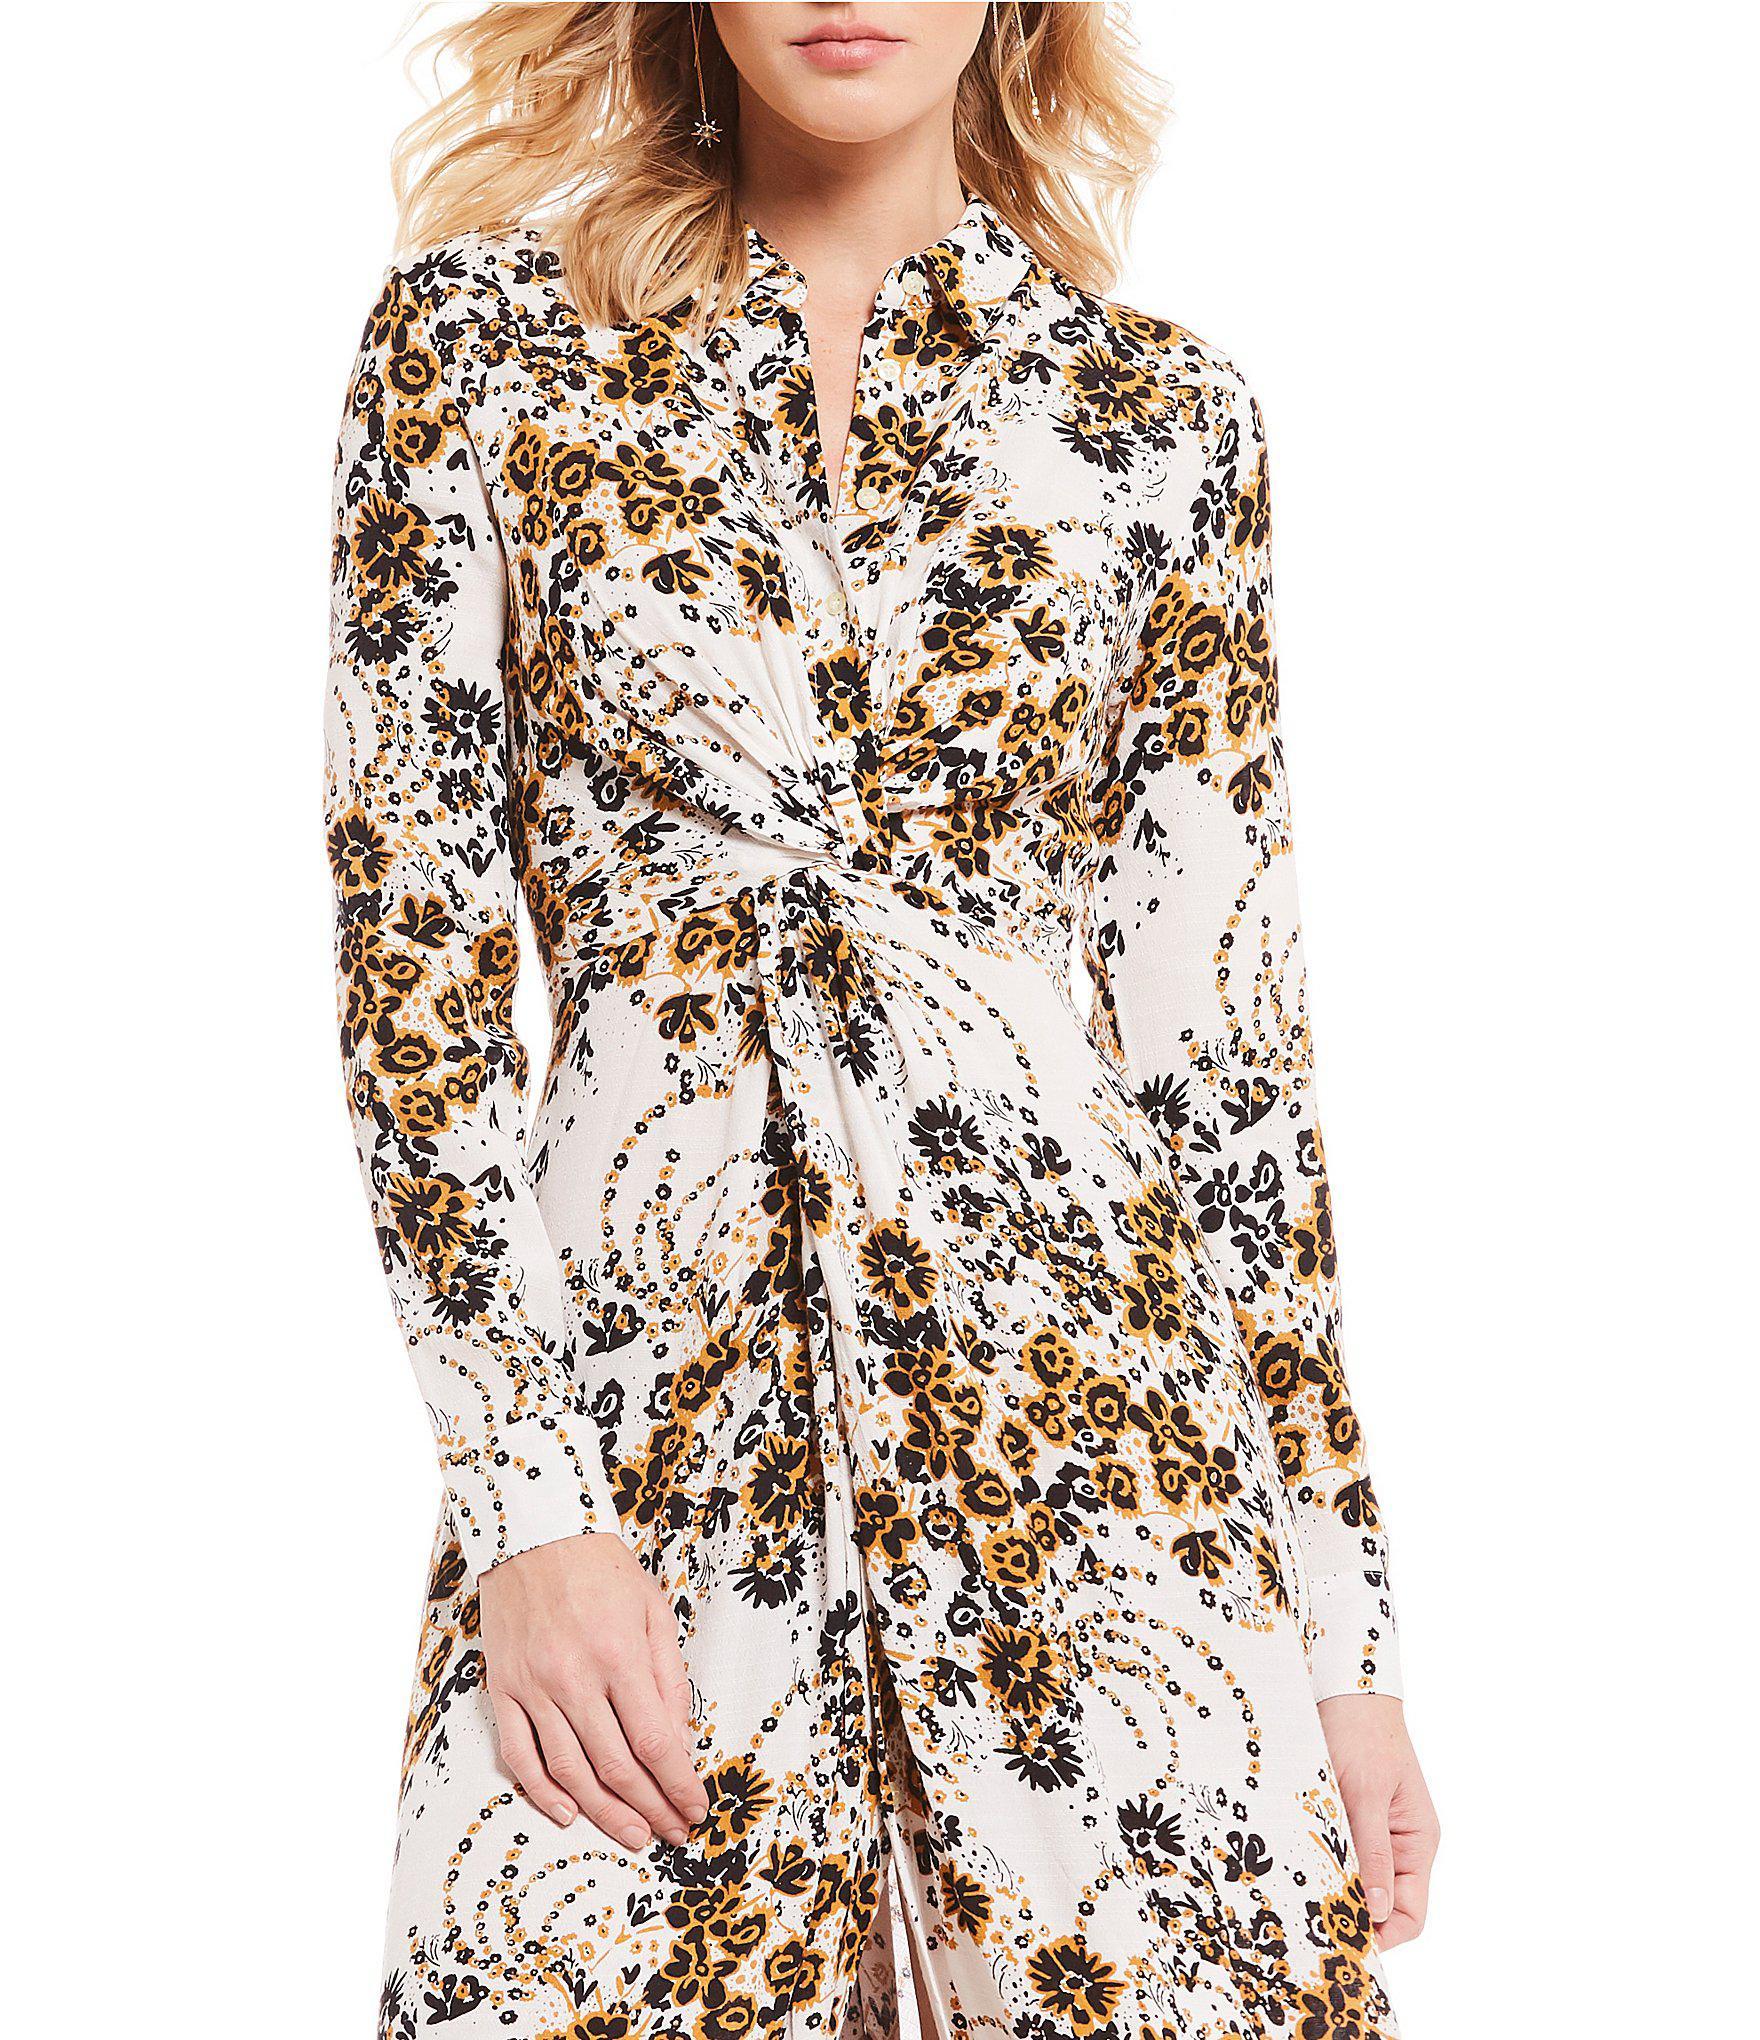 def22b4358f0 Lyst - Free People Tough Love Floral Print Midi Length Shirt Dress ...